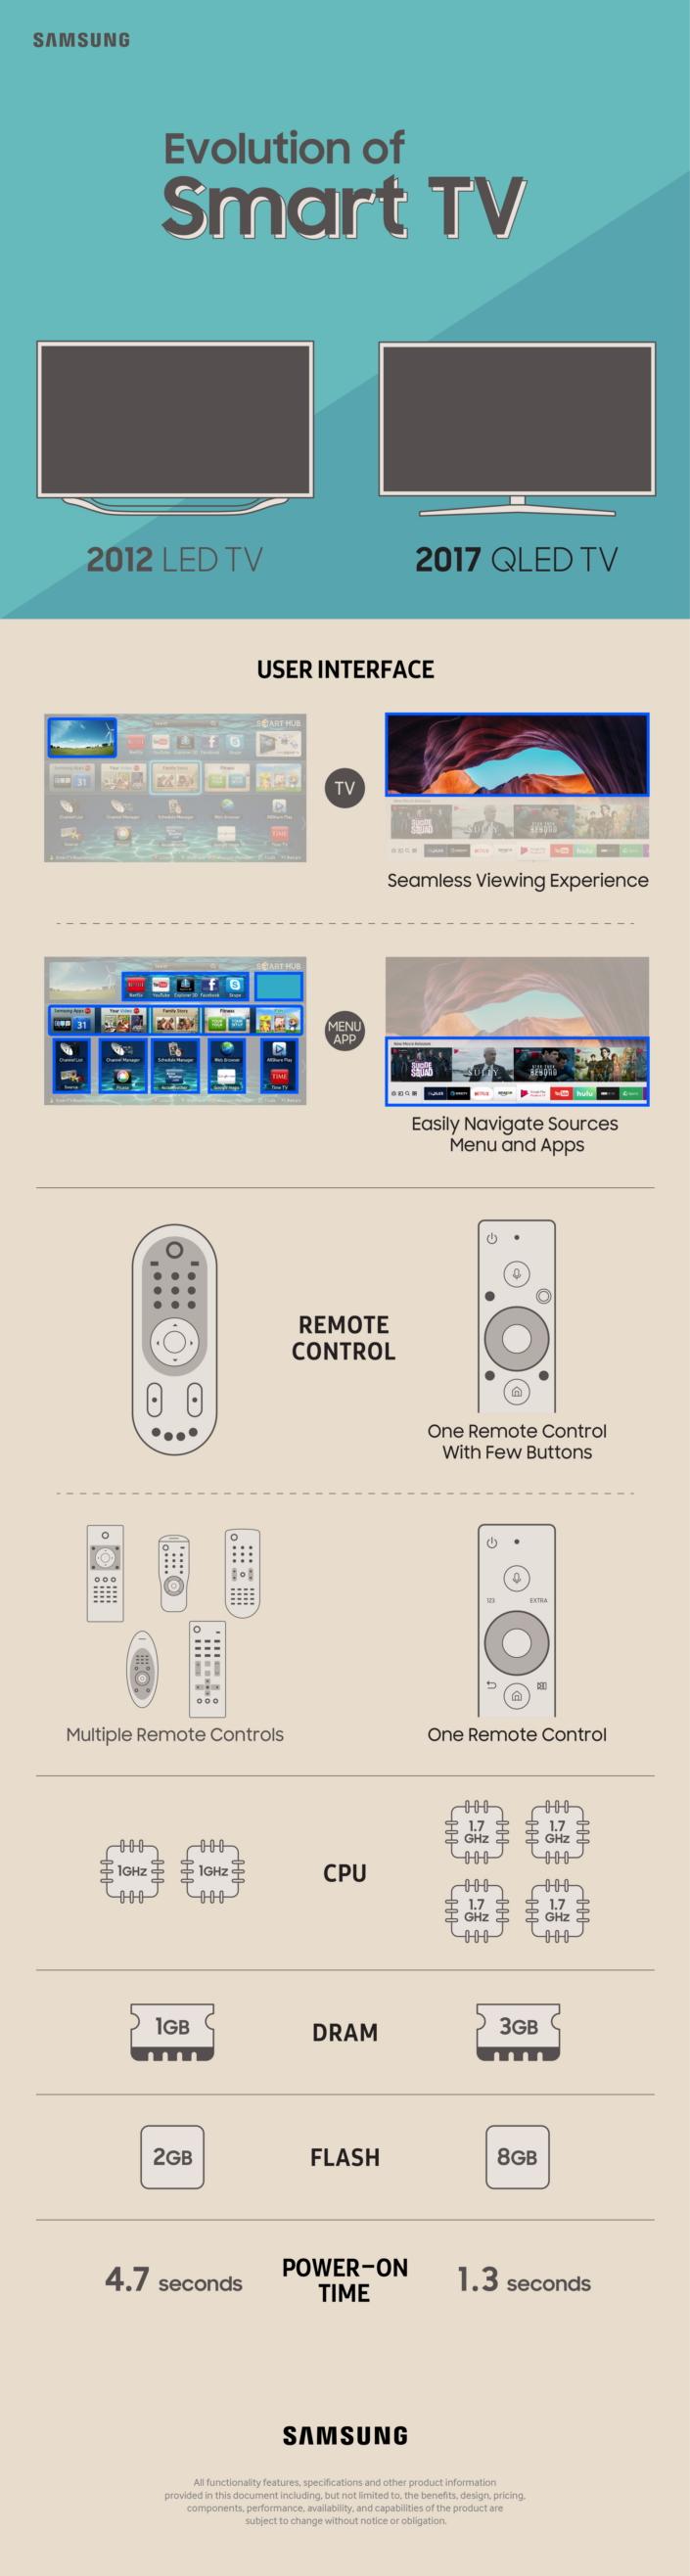 the evolution of samsung s smart tv